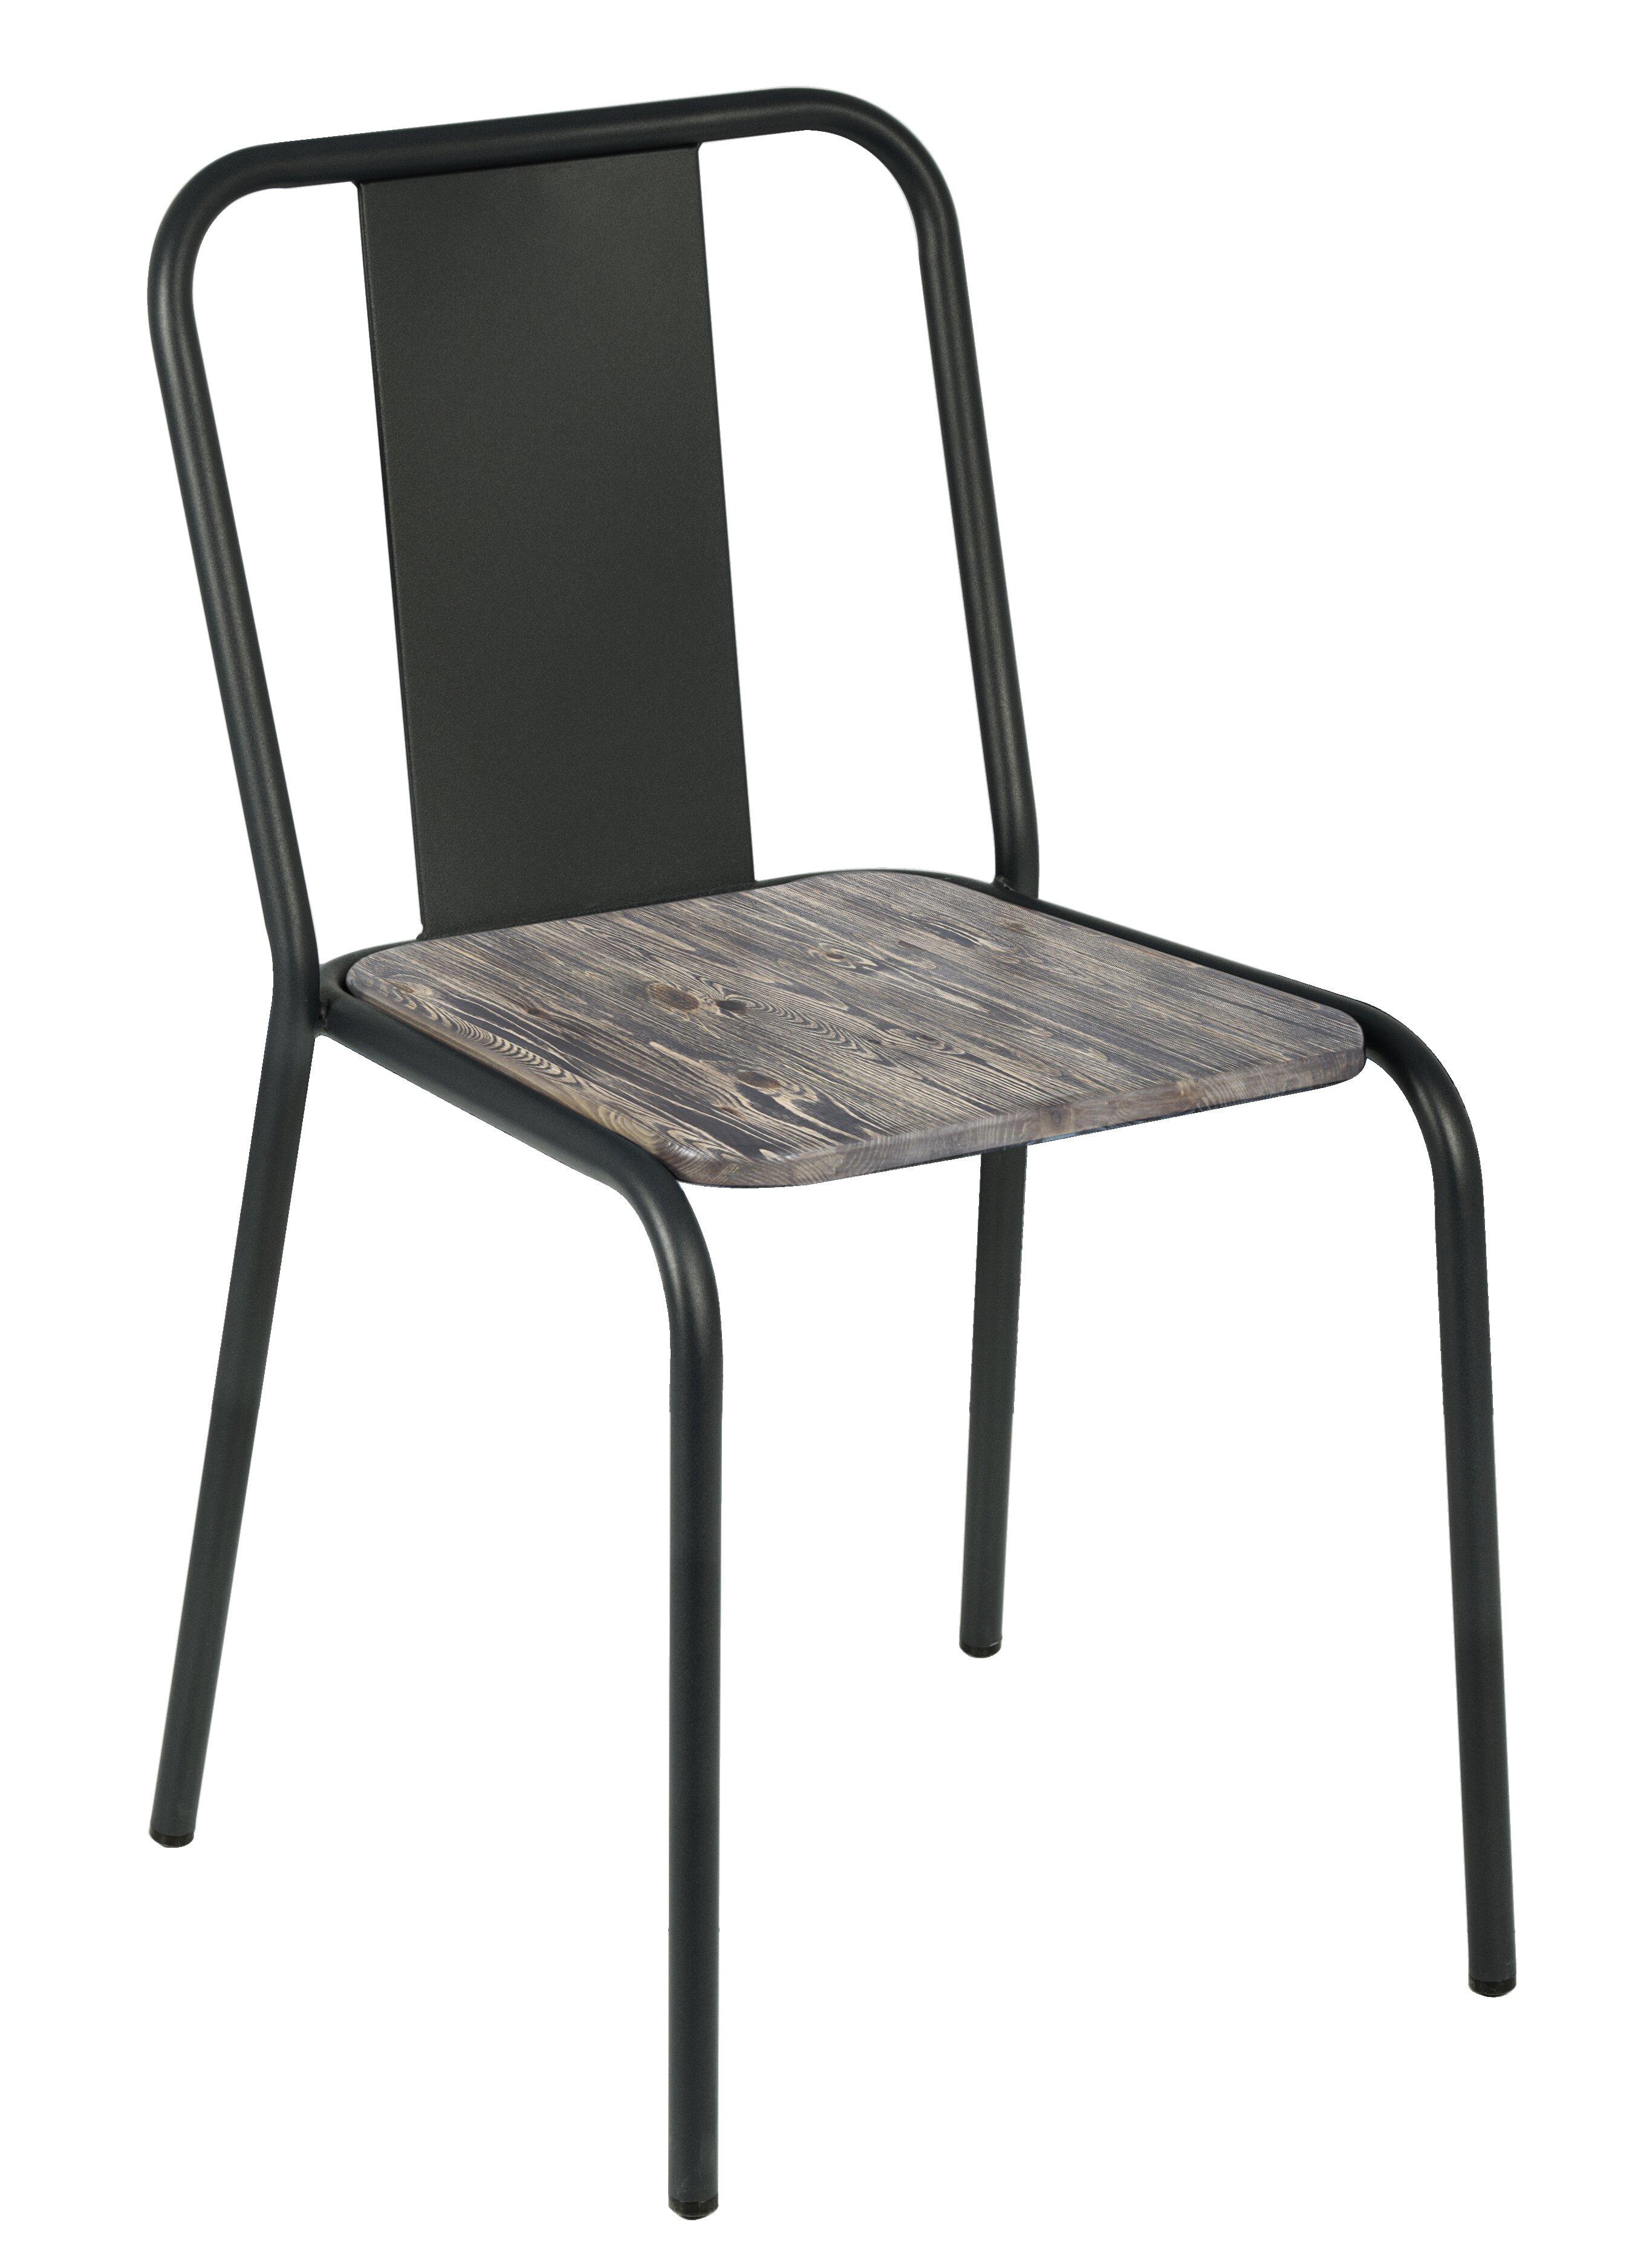 Sainsbury Stacking Garden Chair